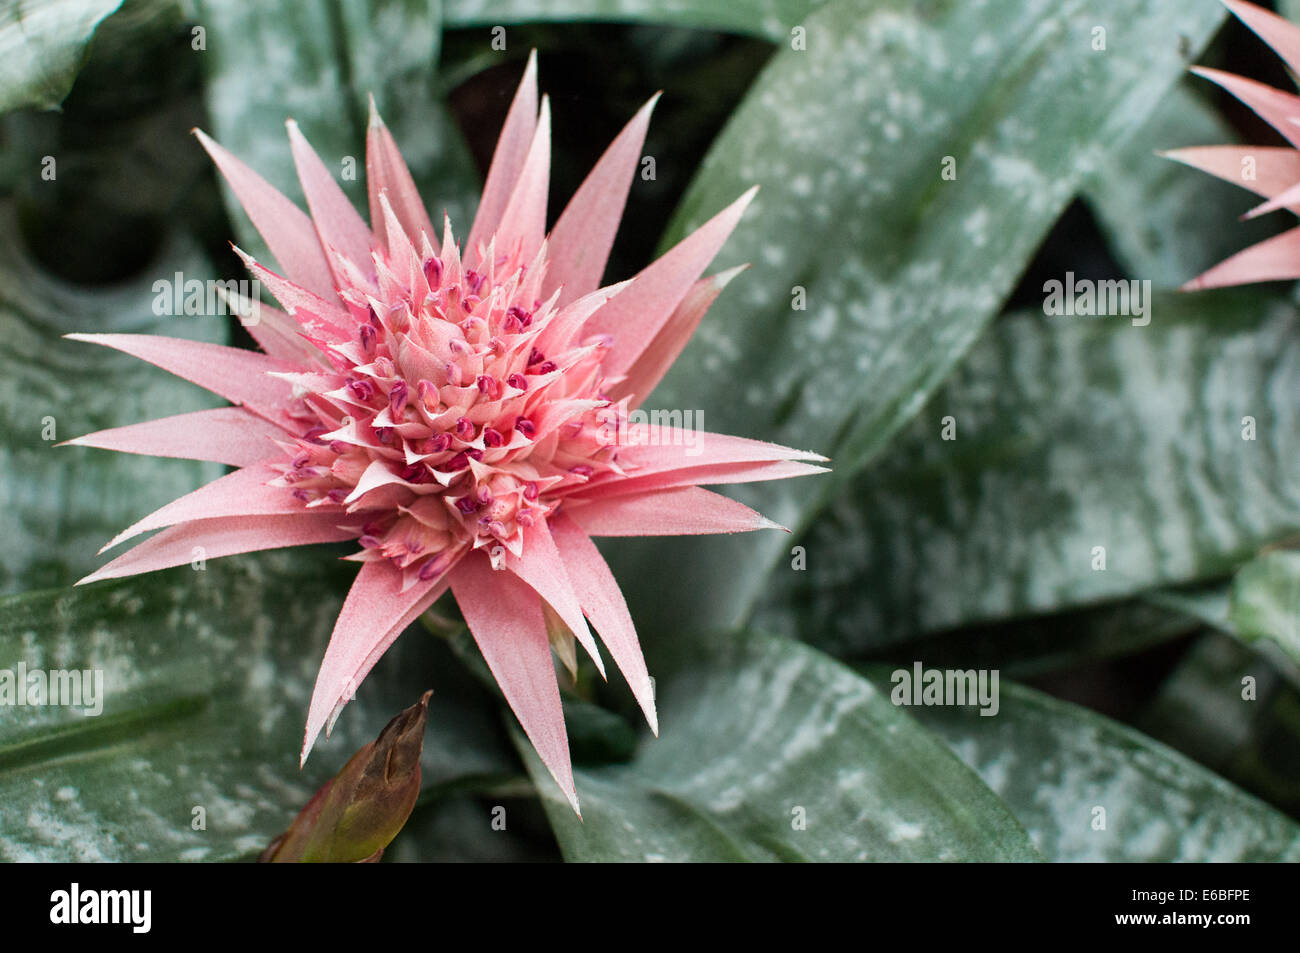 Cactus flower - Stock Image